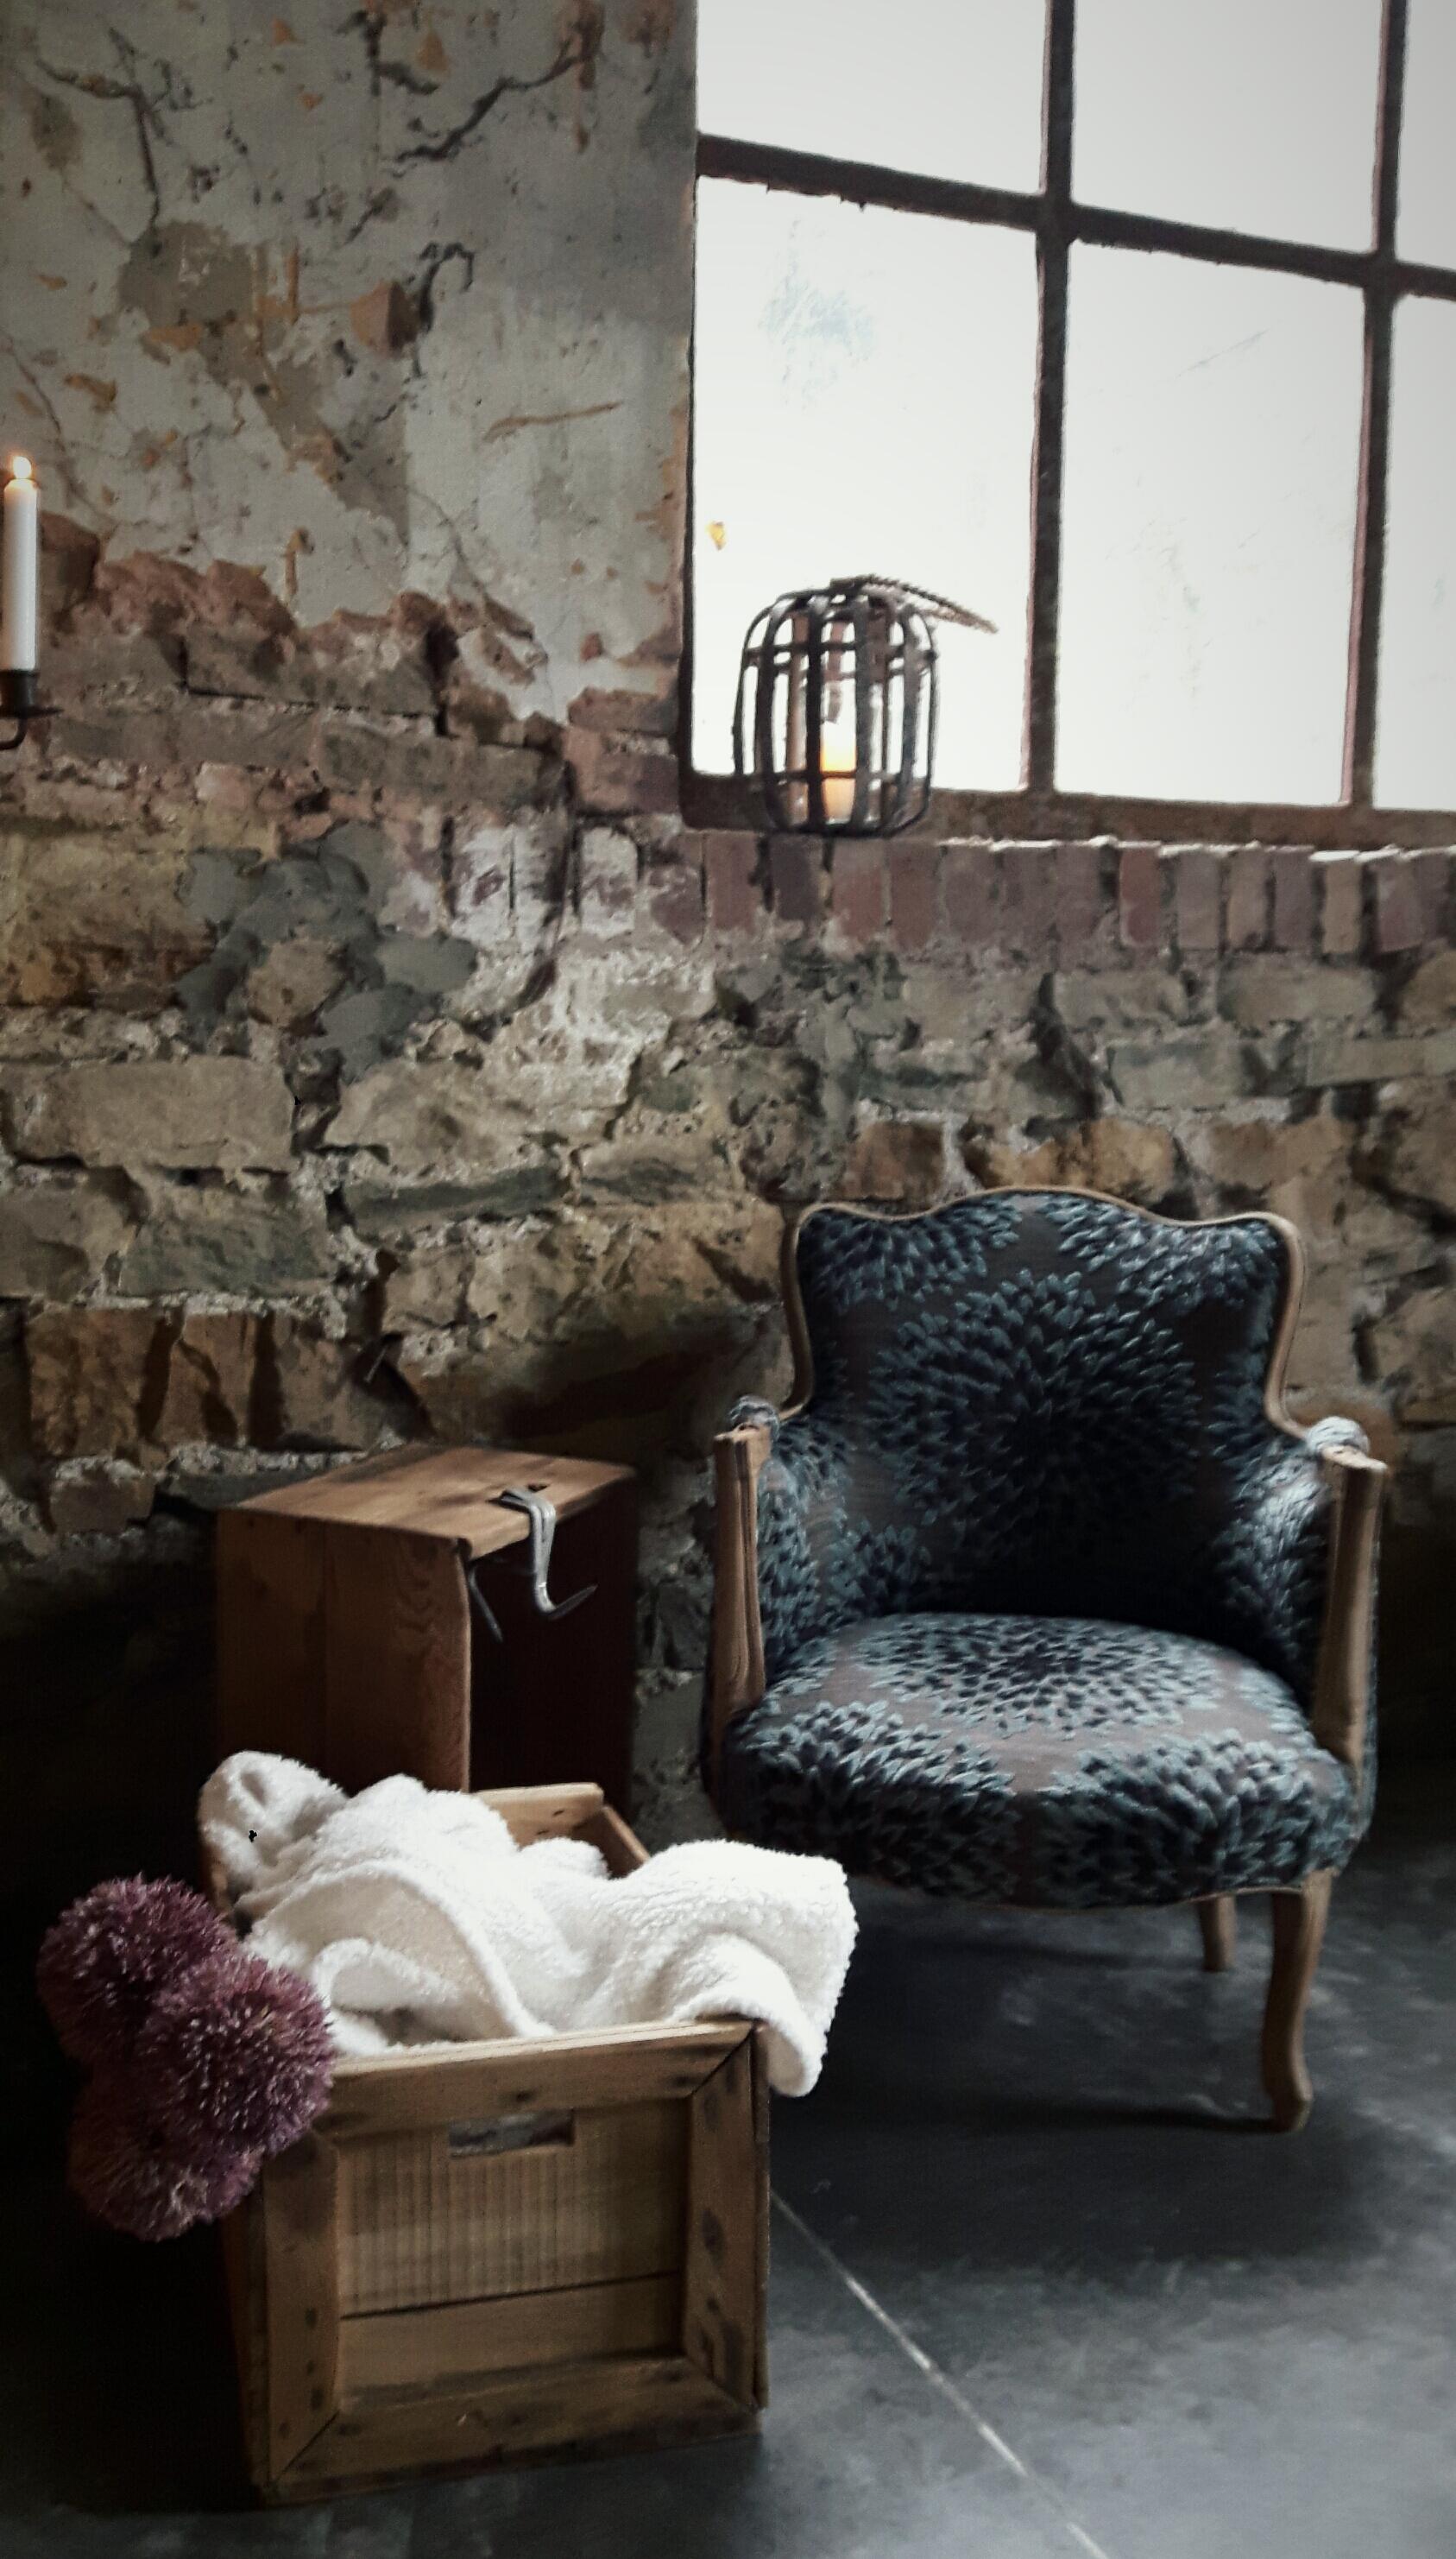 HistoireDco - Garnissage rénovation